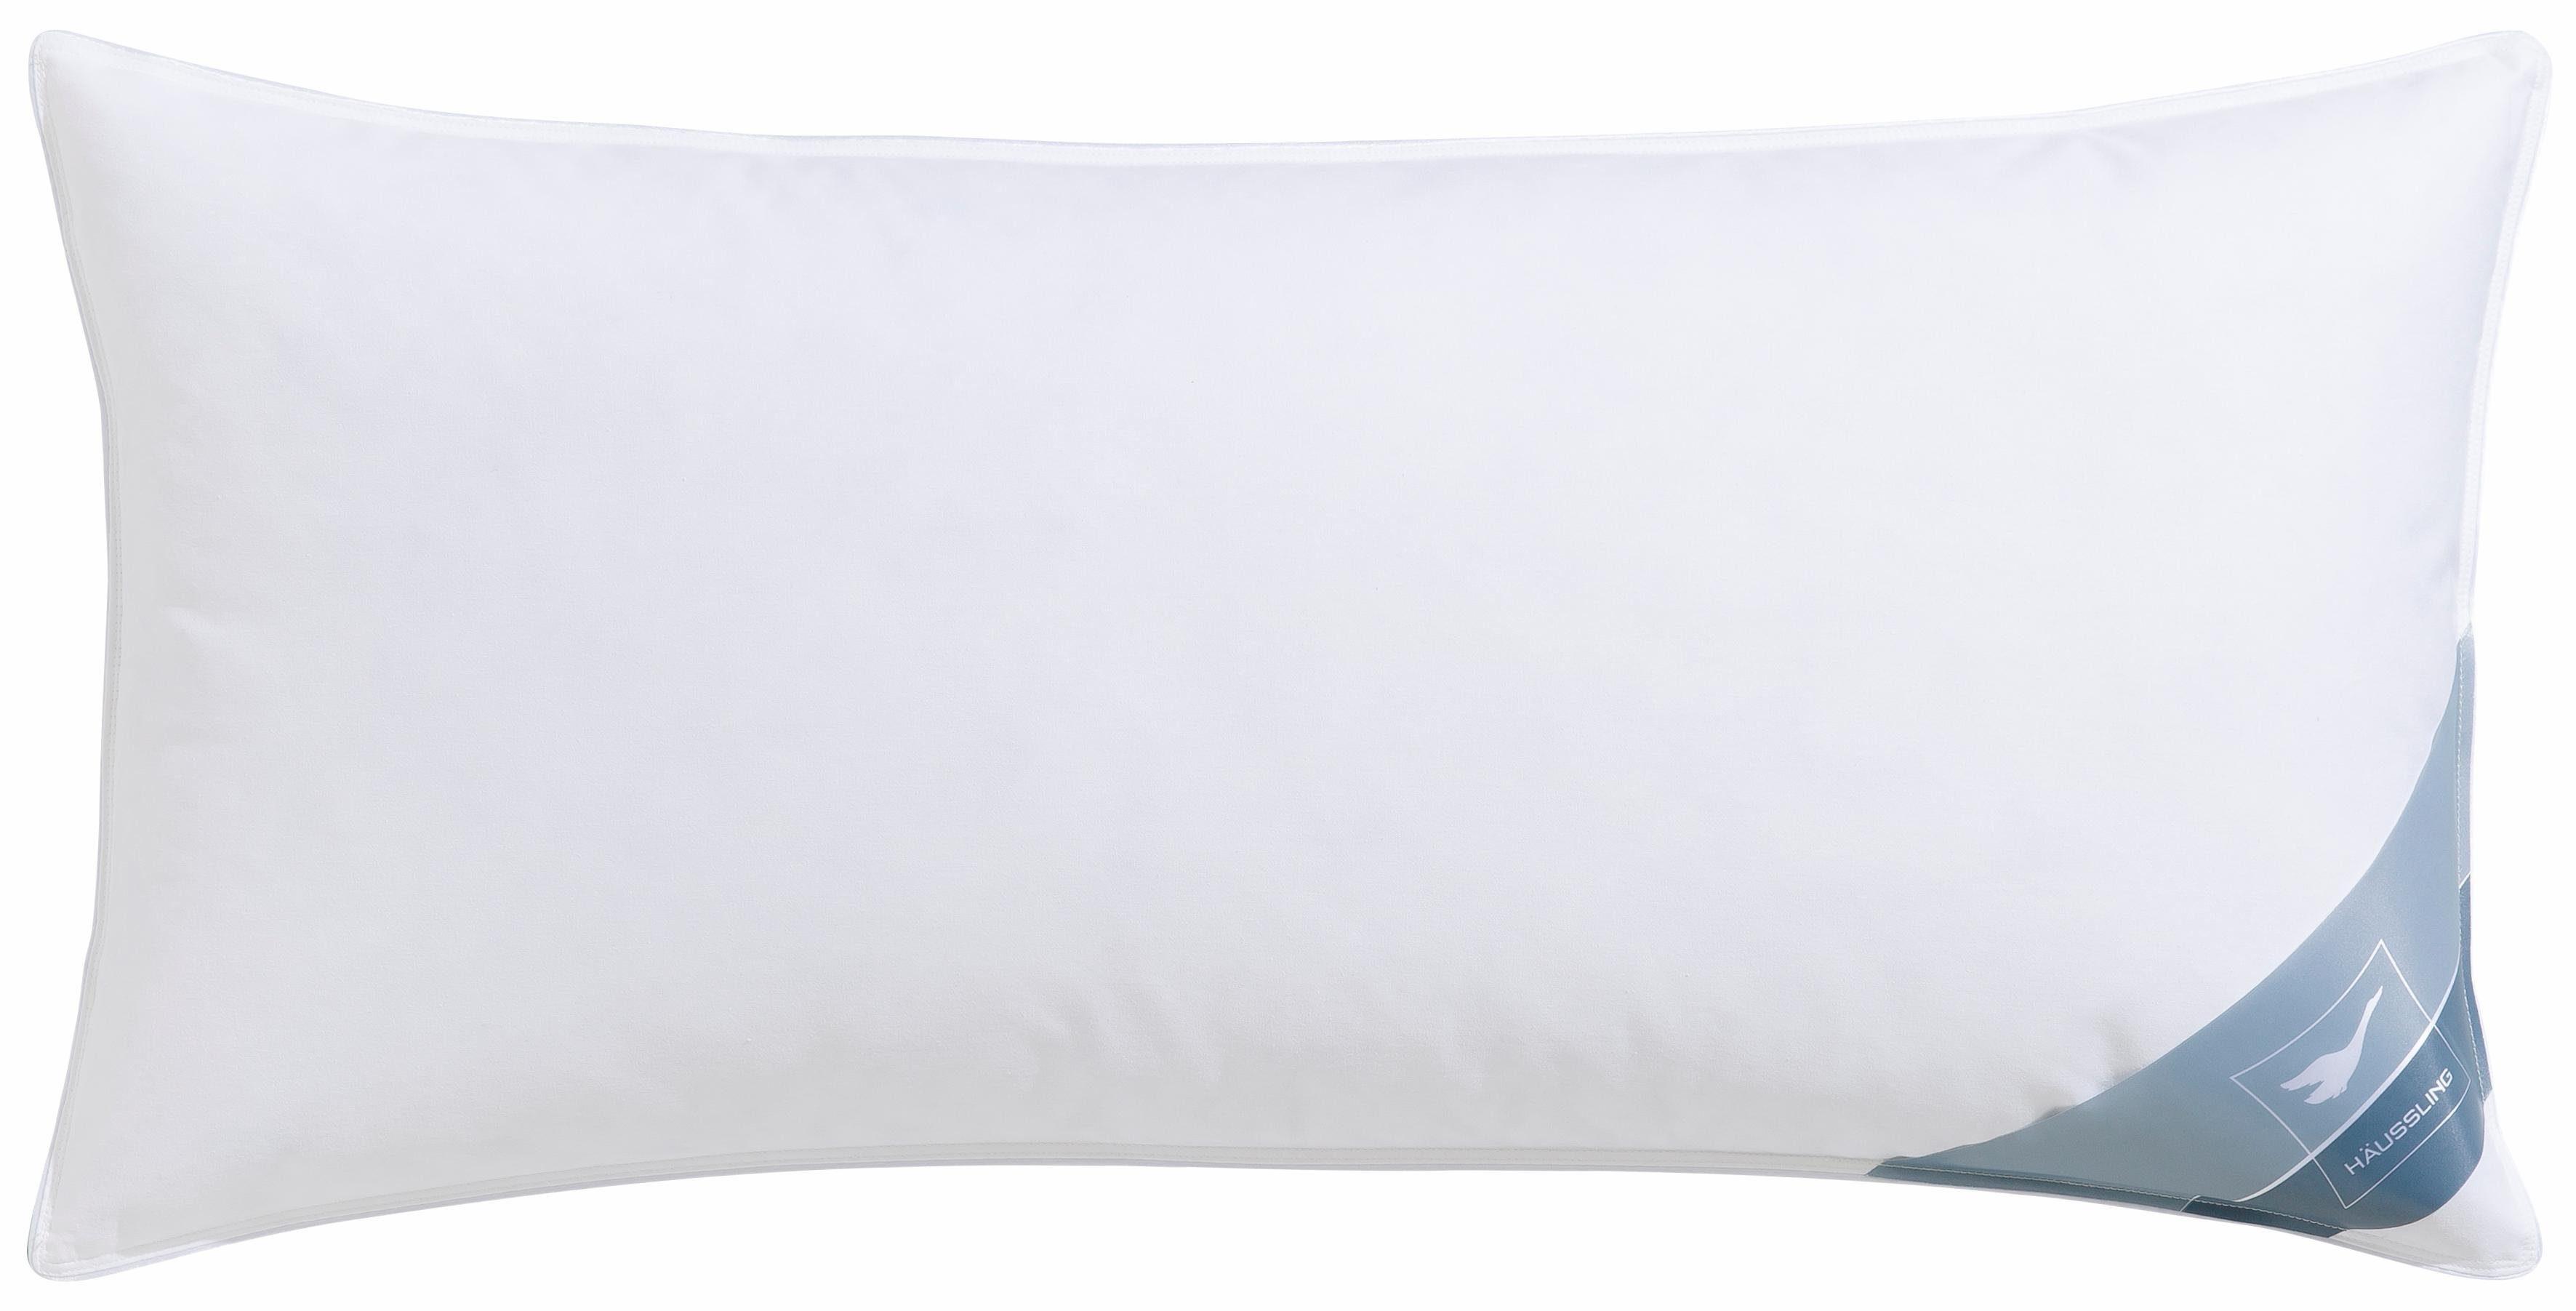 Federnkopfkissen, »Daune Spezial«, Häussling, 85% Federn, 15% Daunen, 40x80 cm